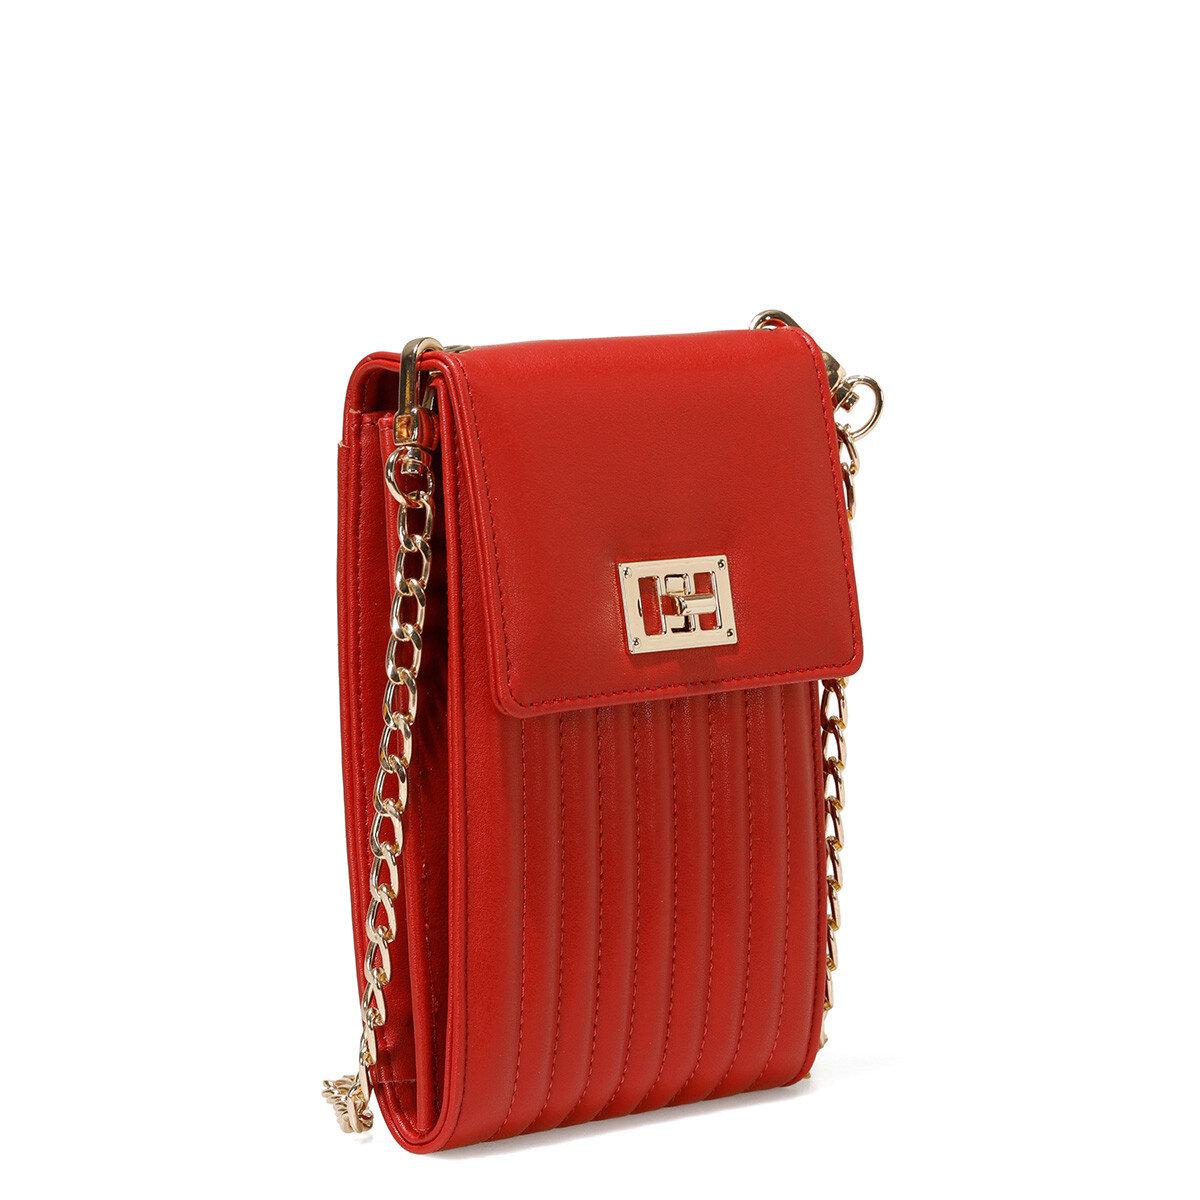 RIBECA Kırmızı Kadın Çapraz Çanta